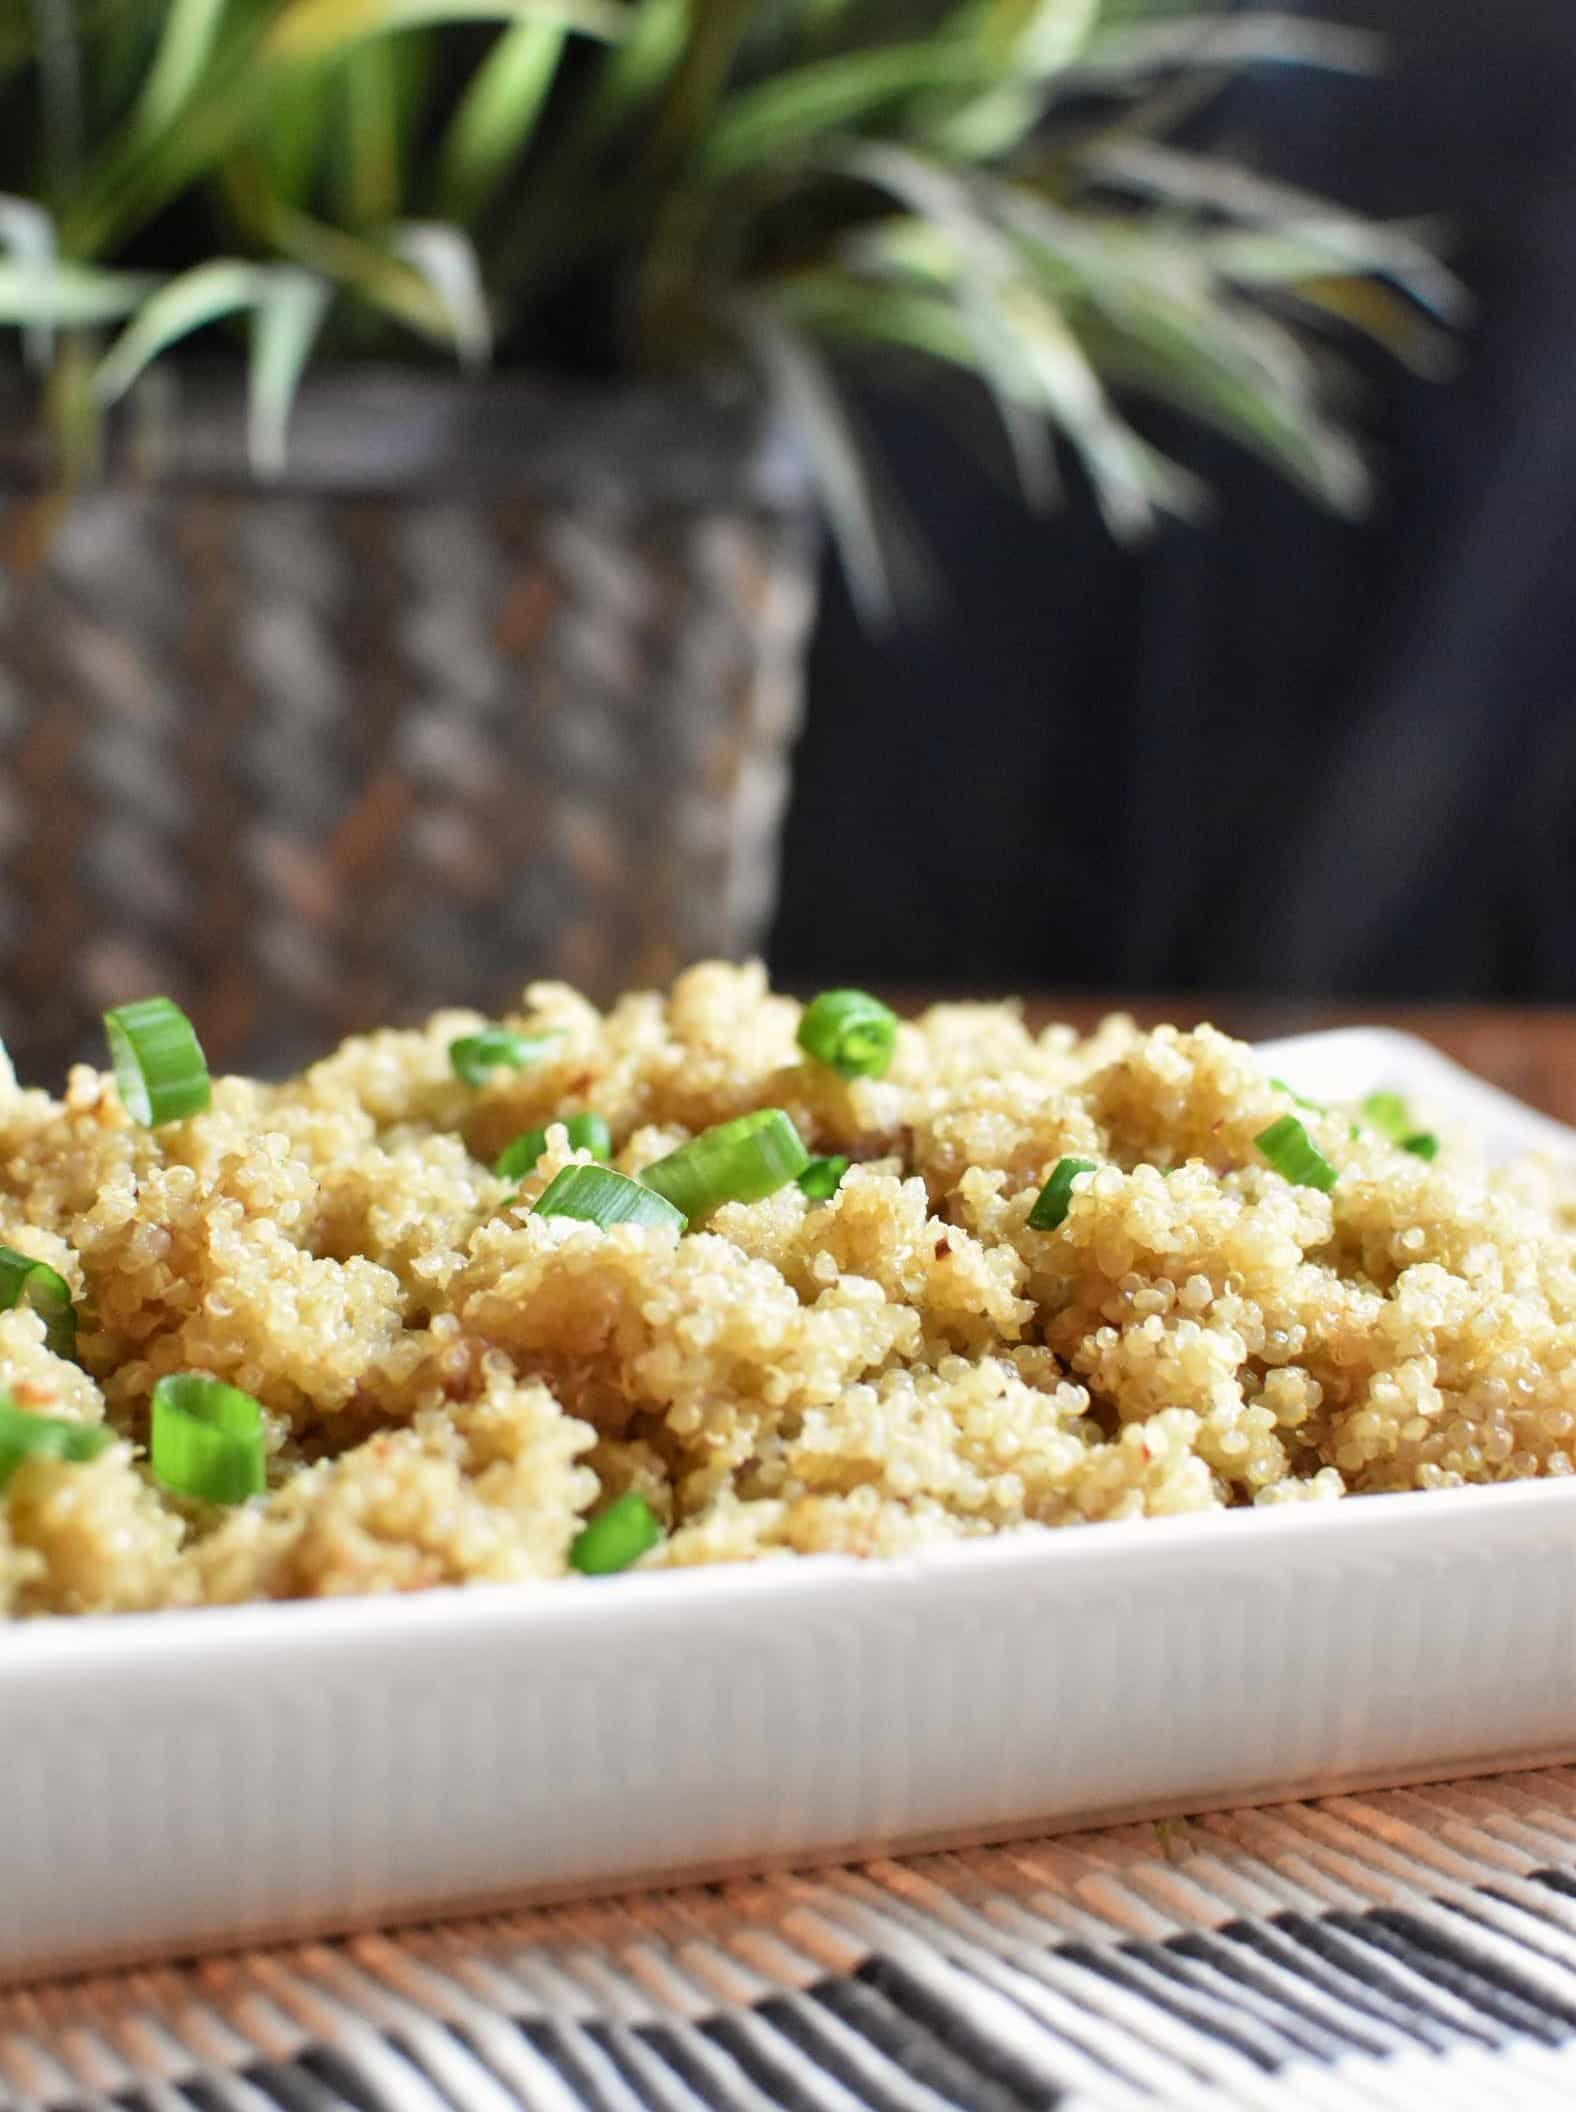 One of the best quinoa recipes